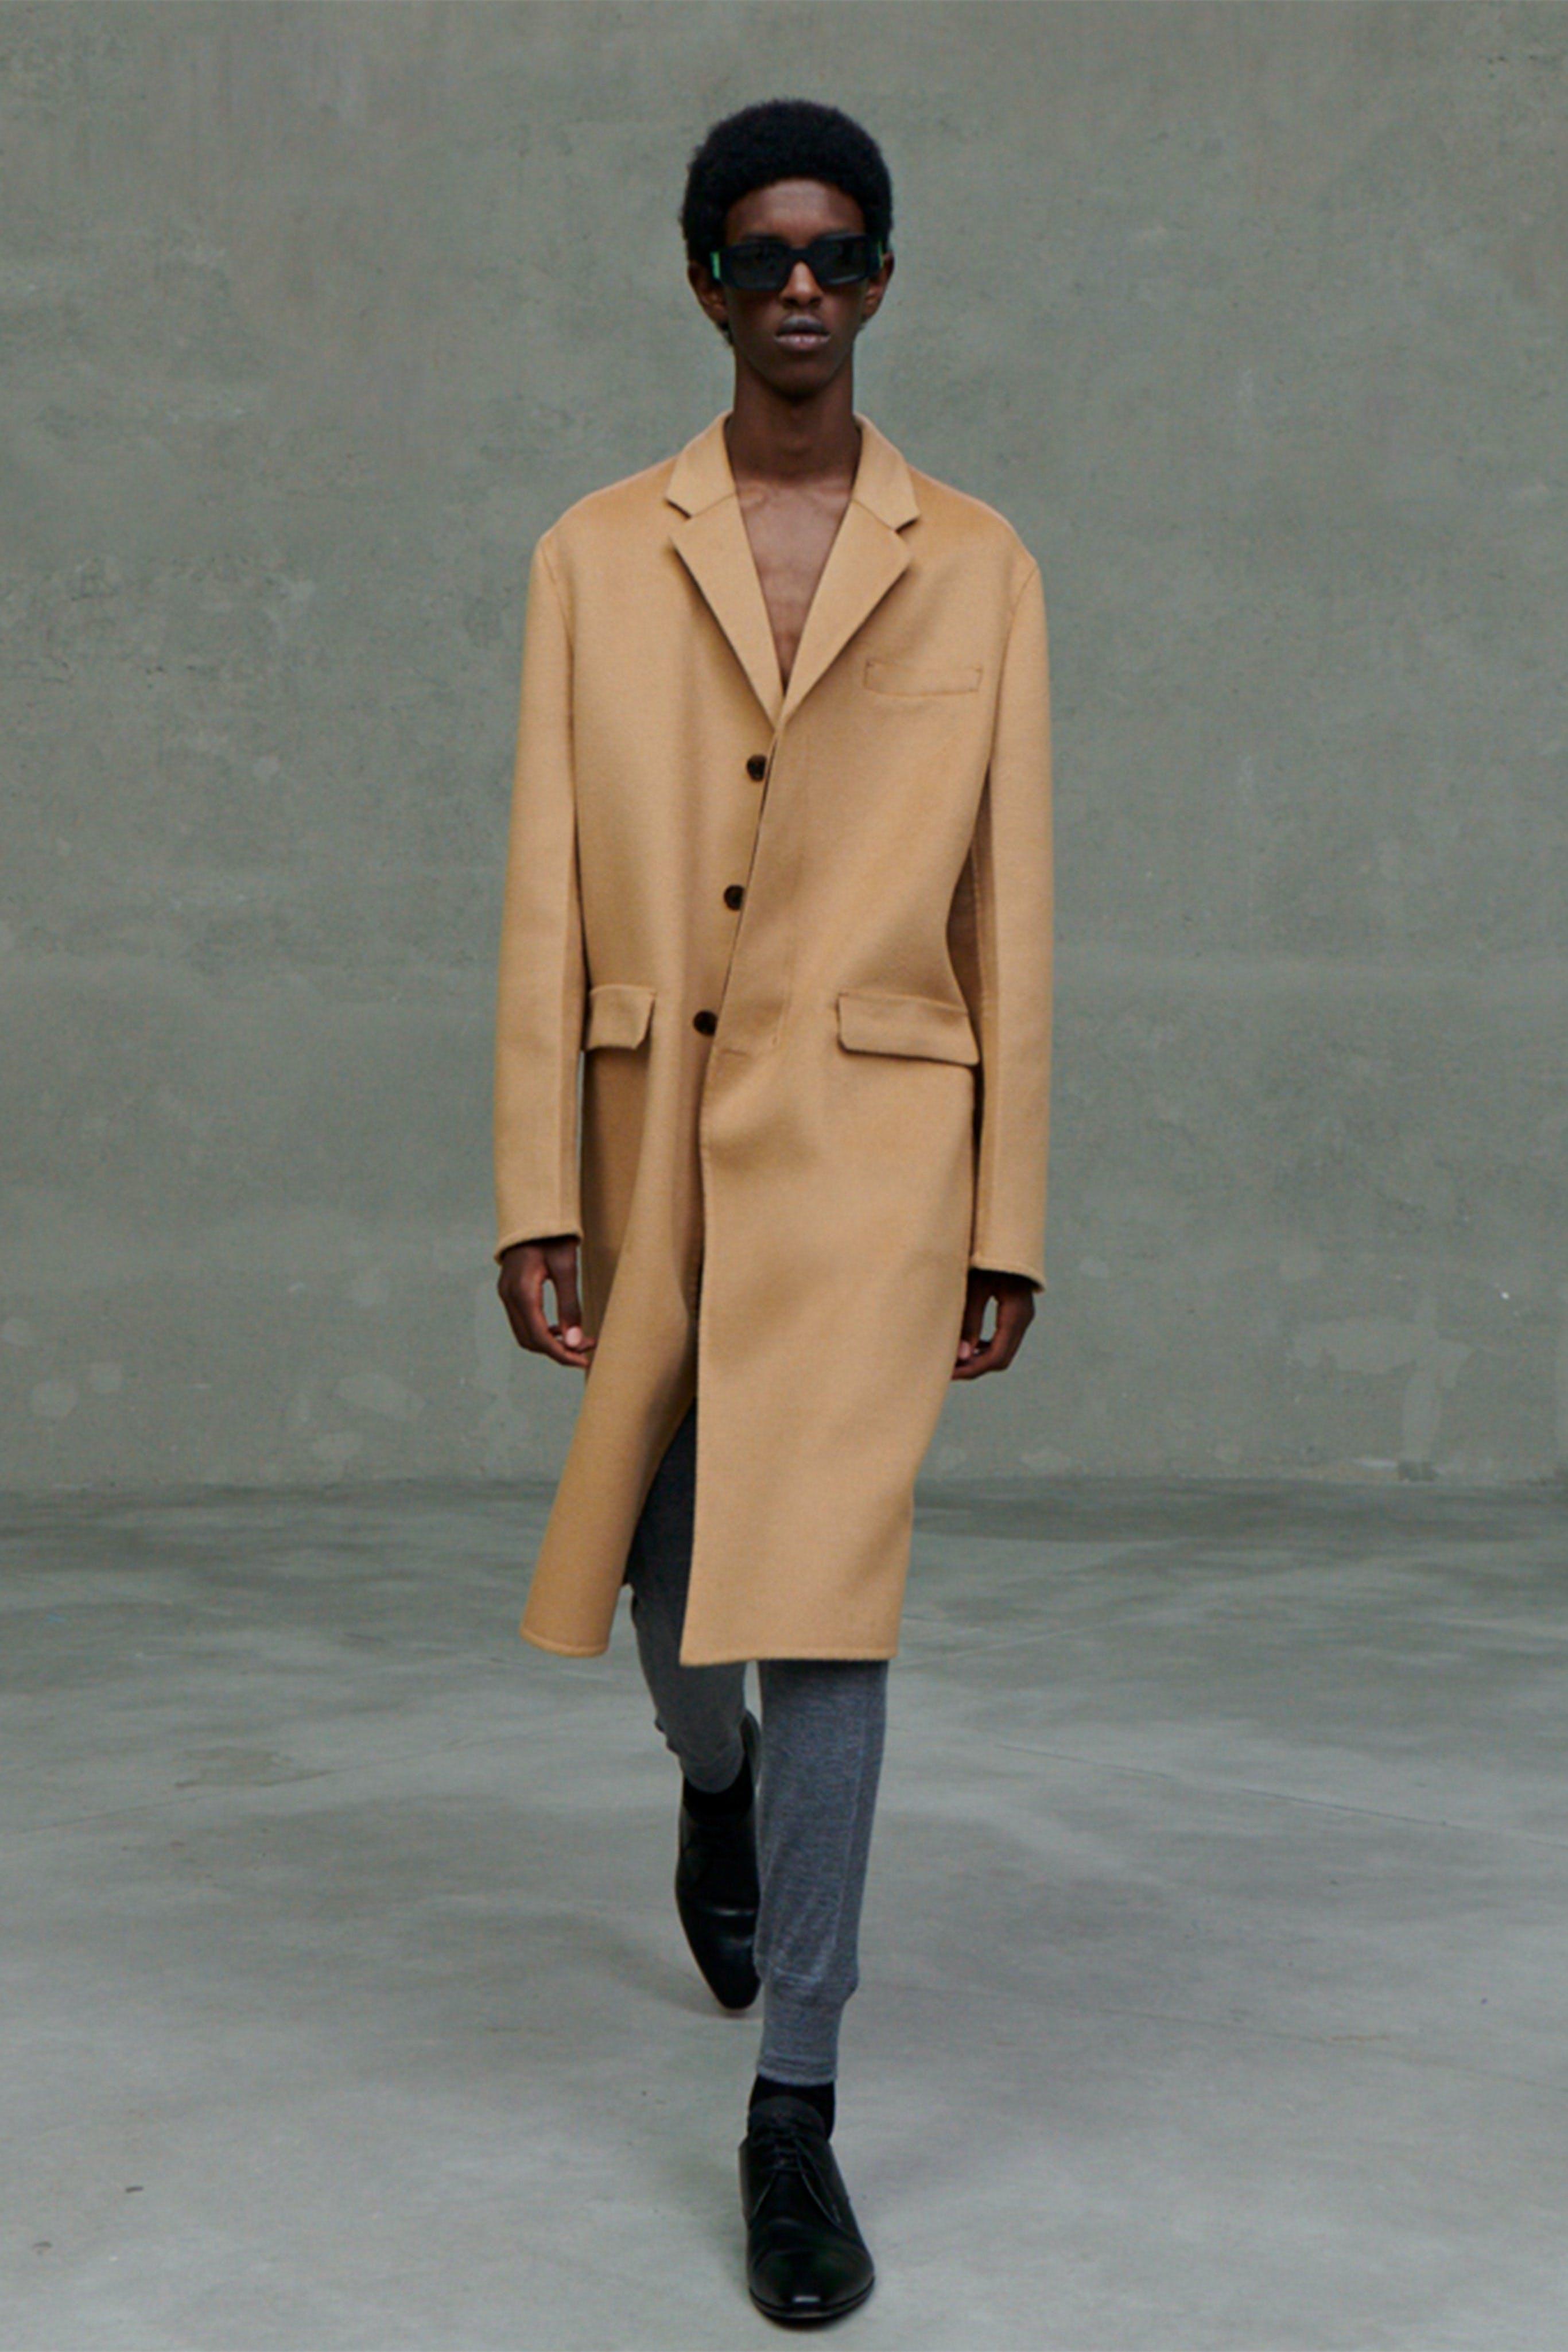 Prada Spring 2021 Menswear.